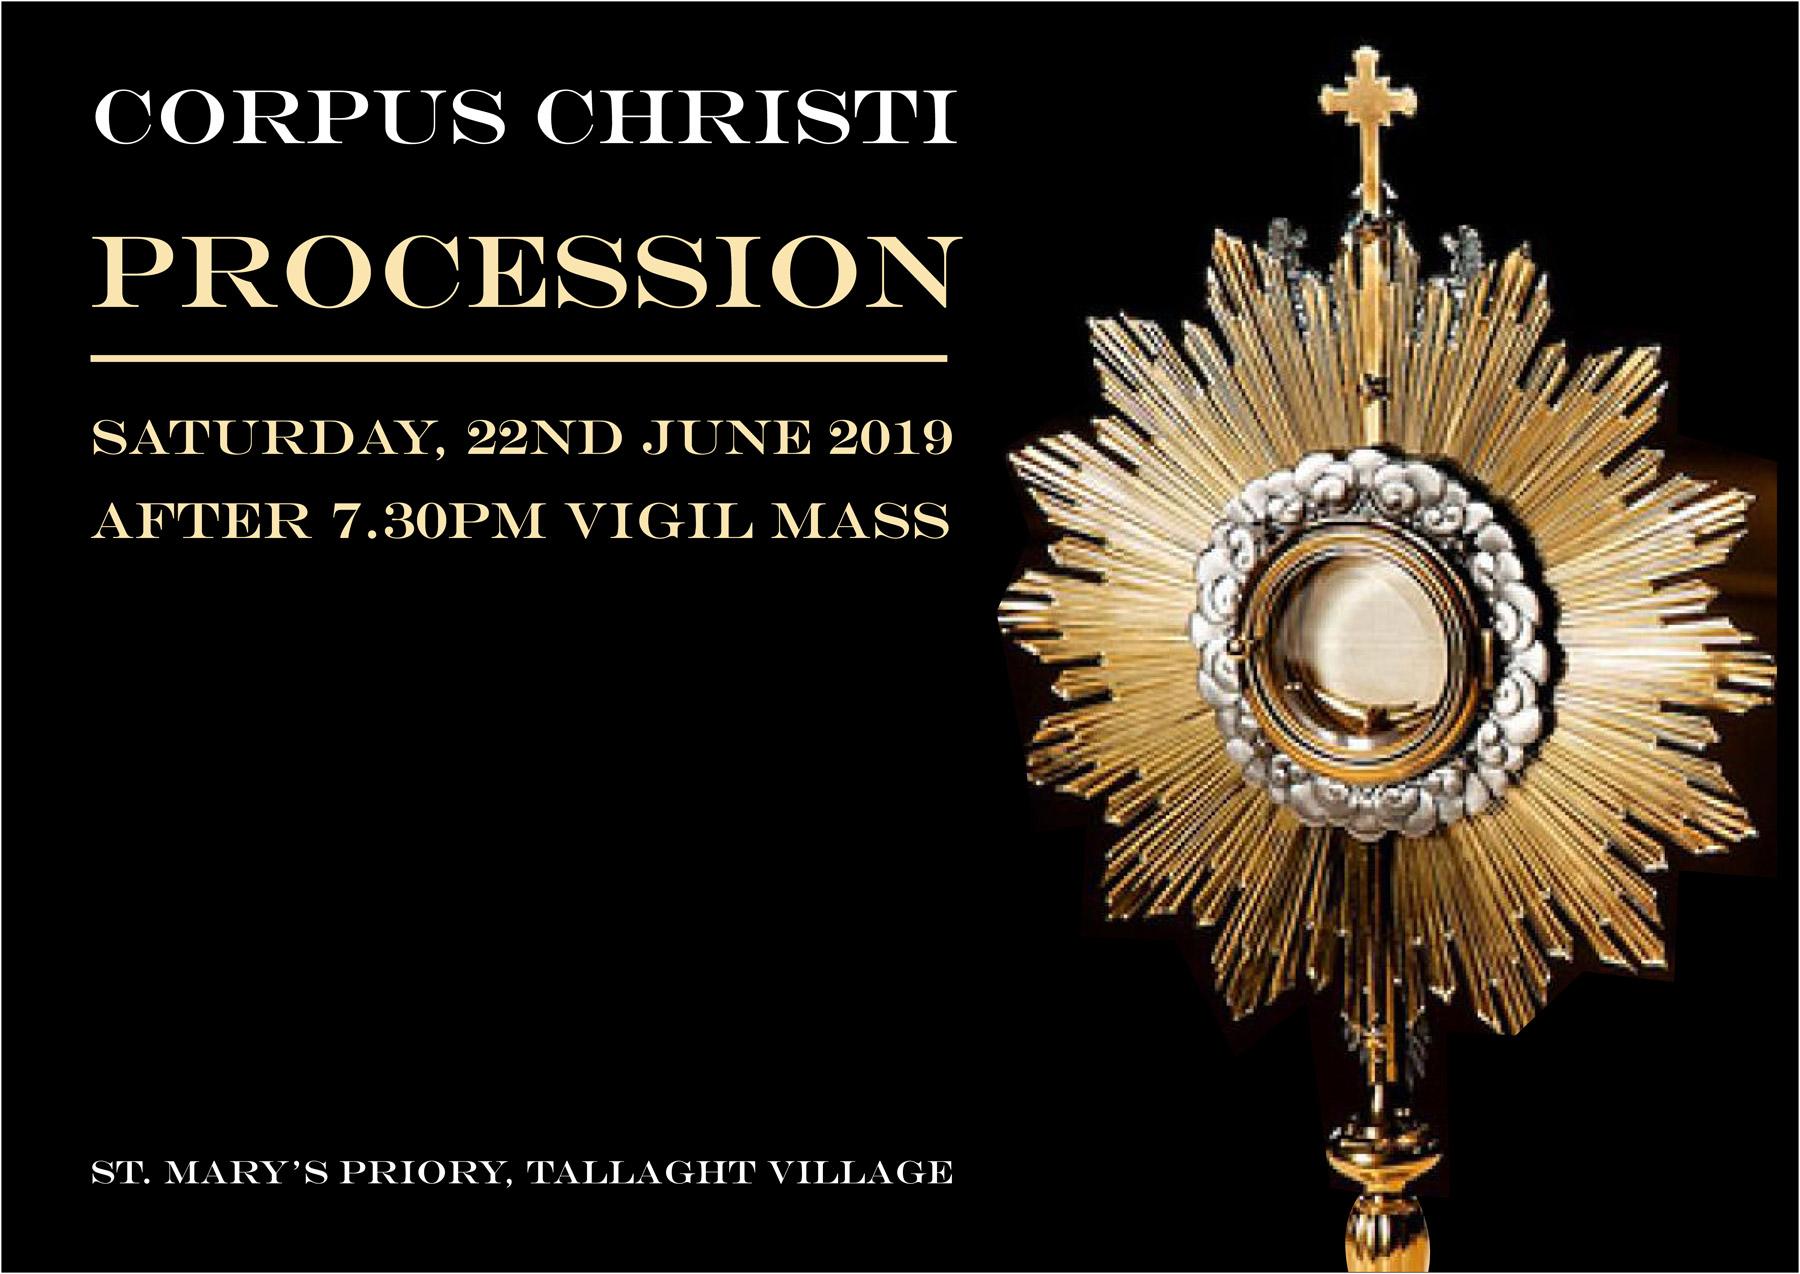 Corpus Christi Procession - poster